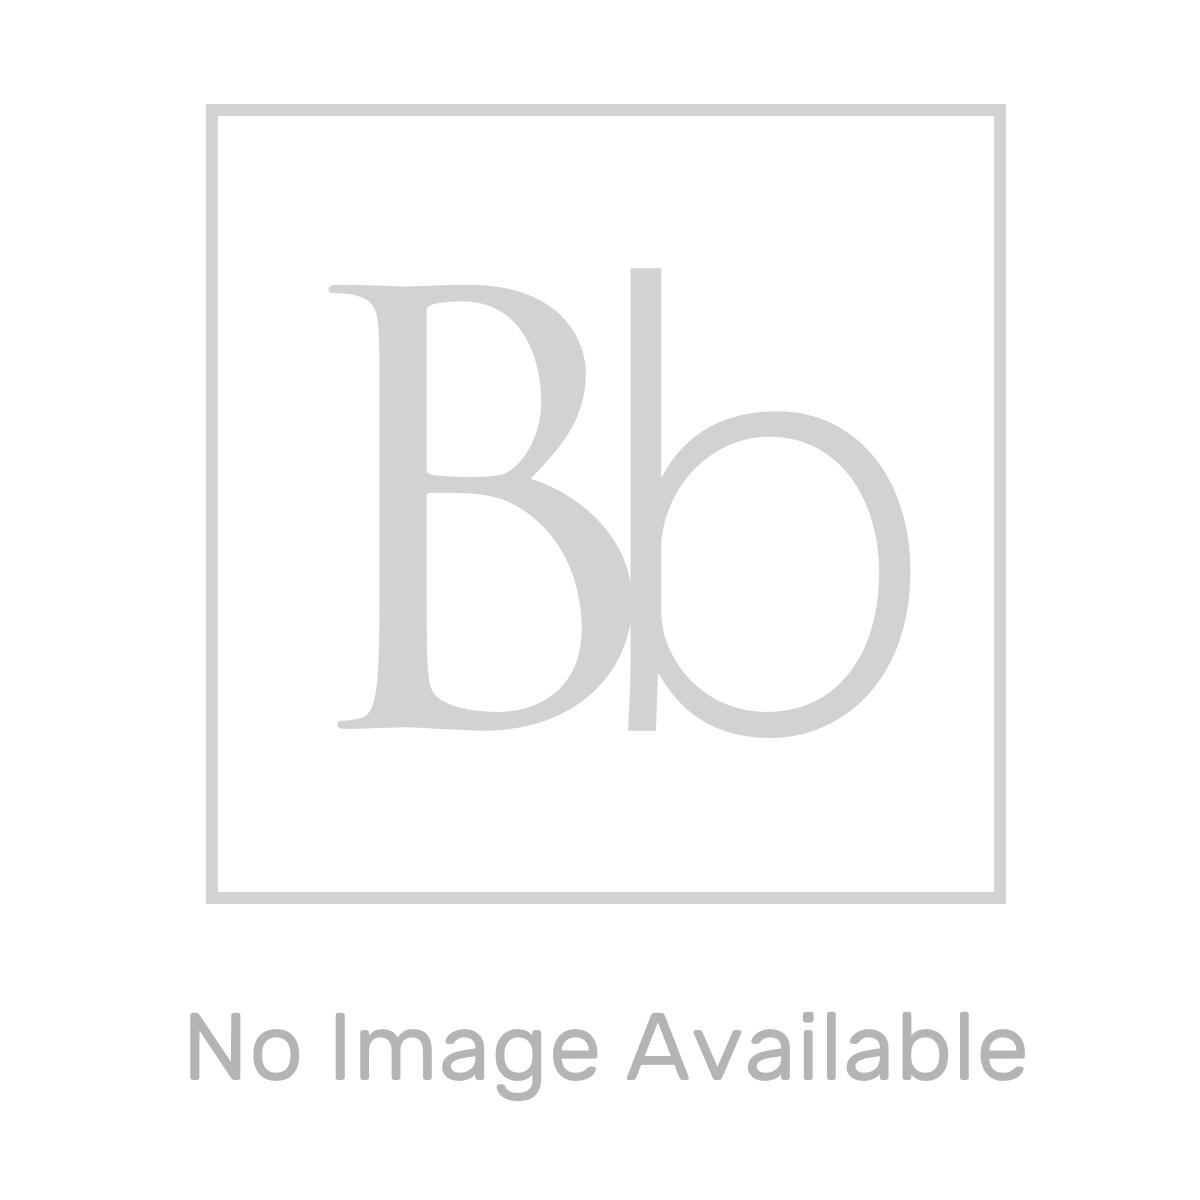 RAK Series 600 Short Projection Toilet 600mm with sandwich Soft Close Seat